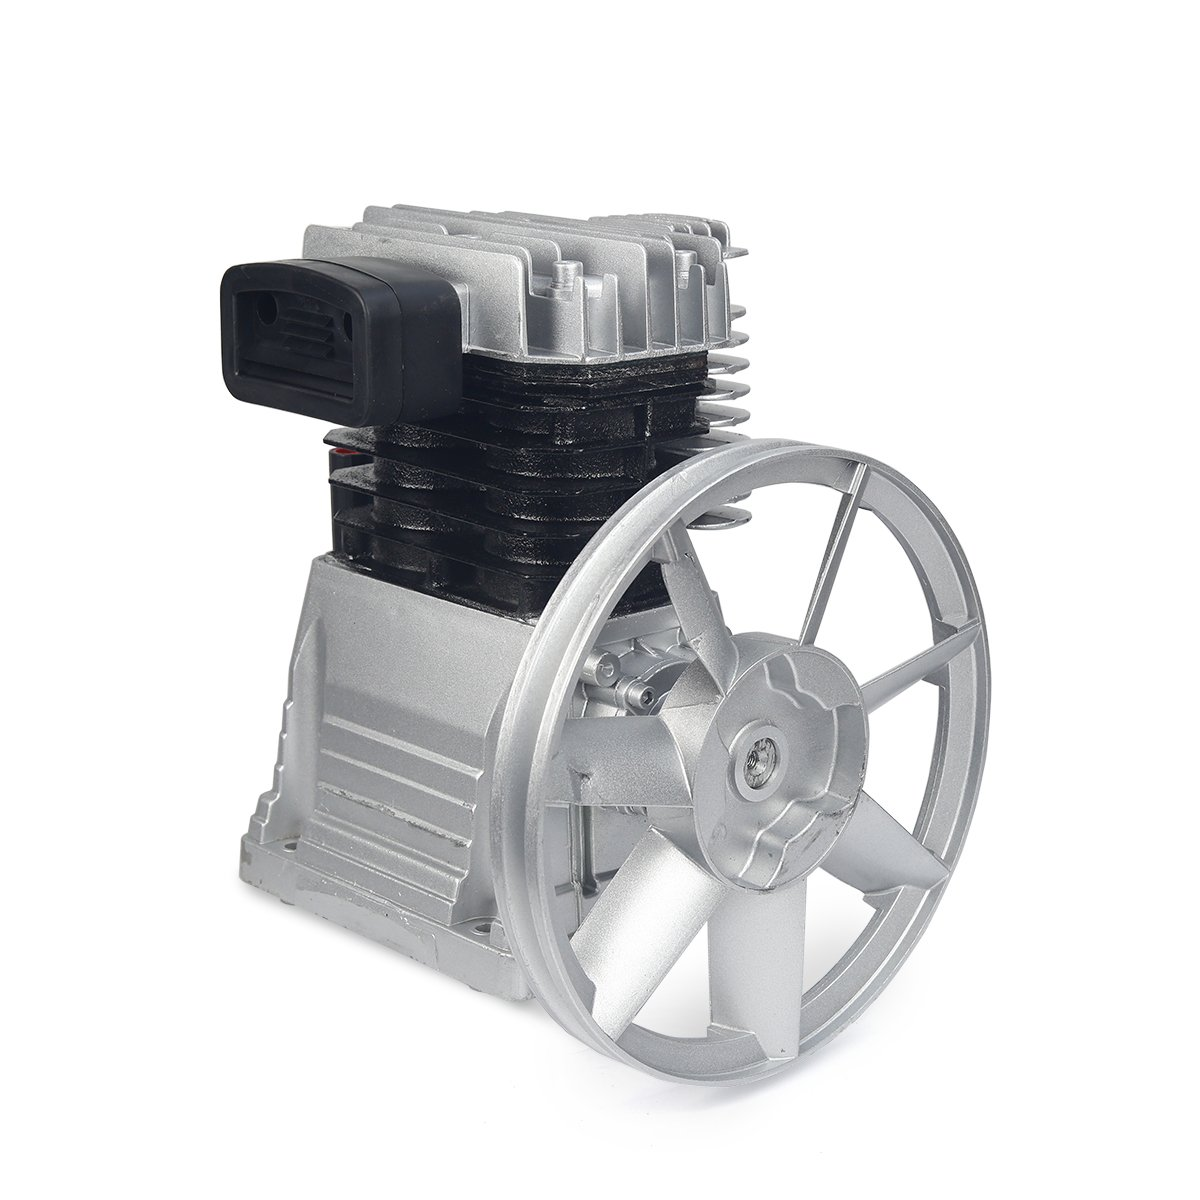 XtremepowerUS Pro Aluminium Air Compressor Pump 3 HP 11.5CFM 145PSI Pulley